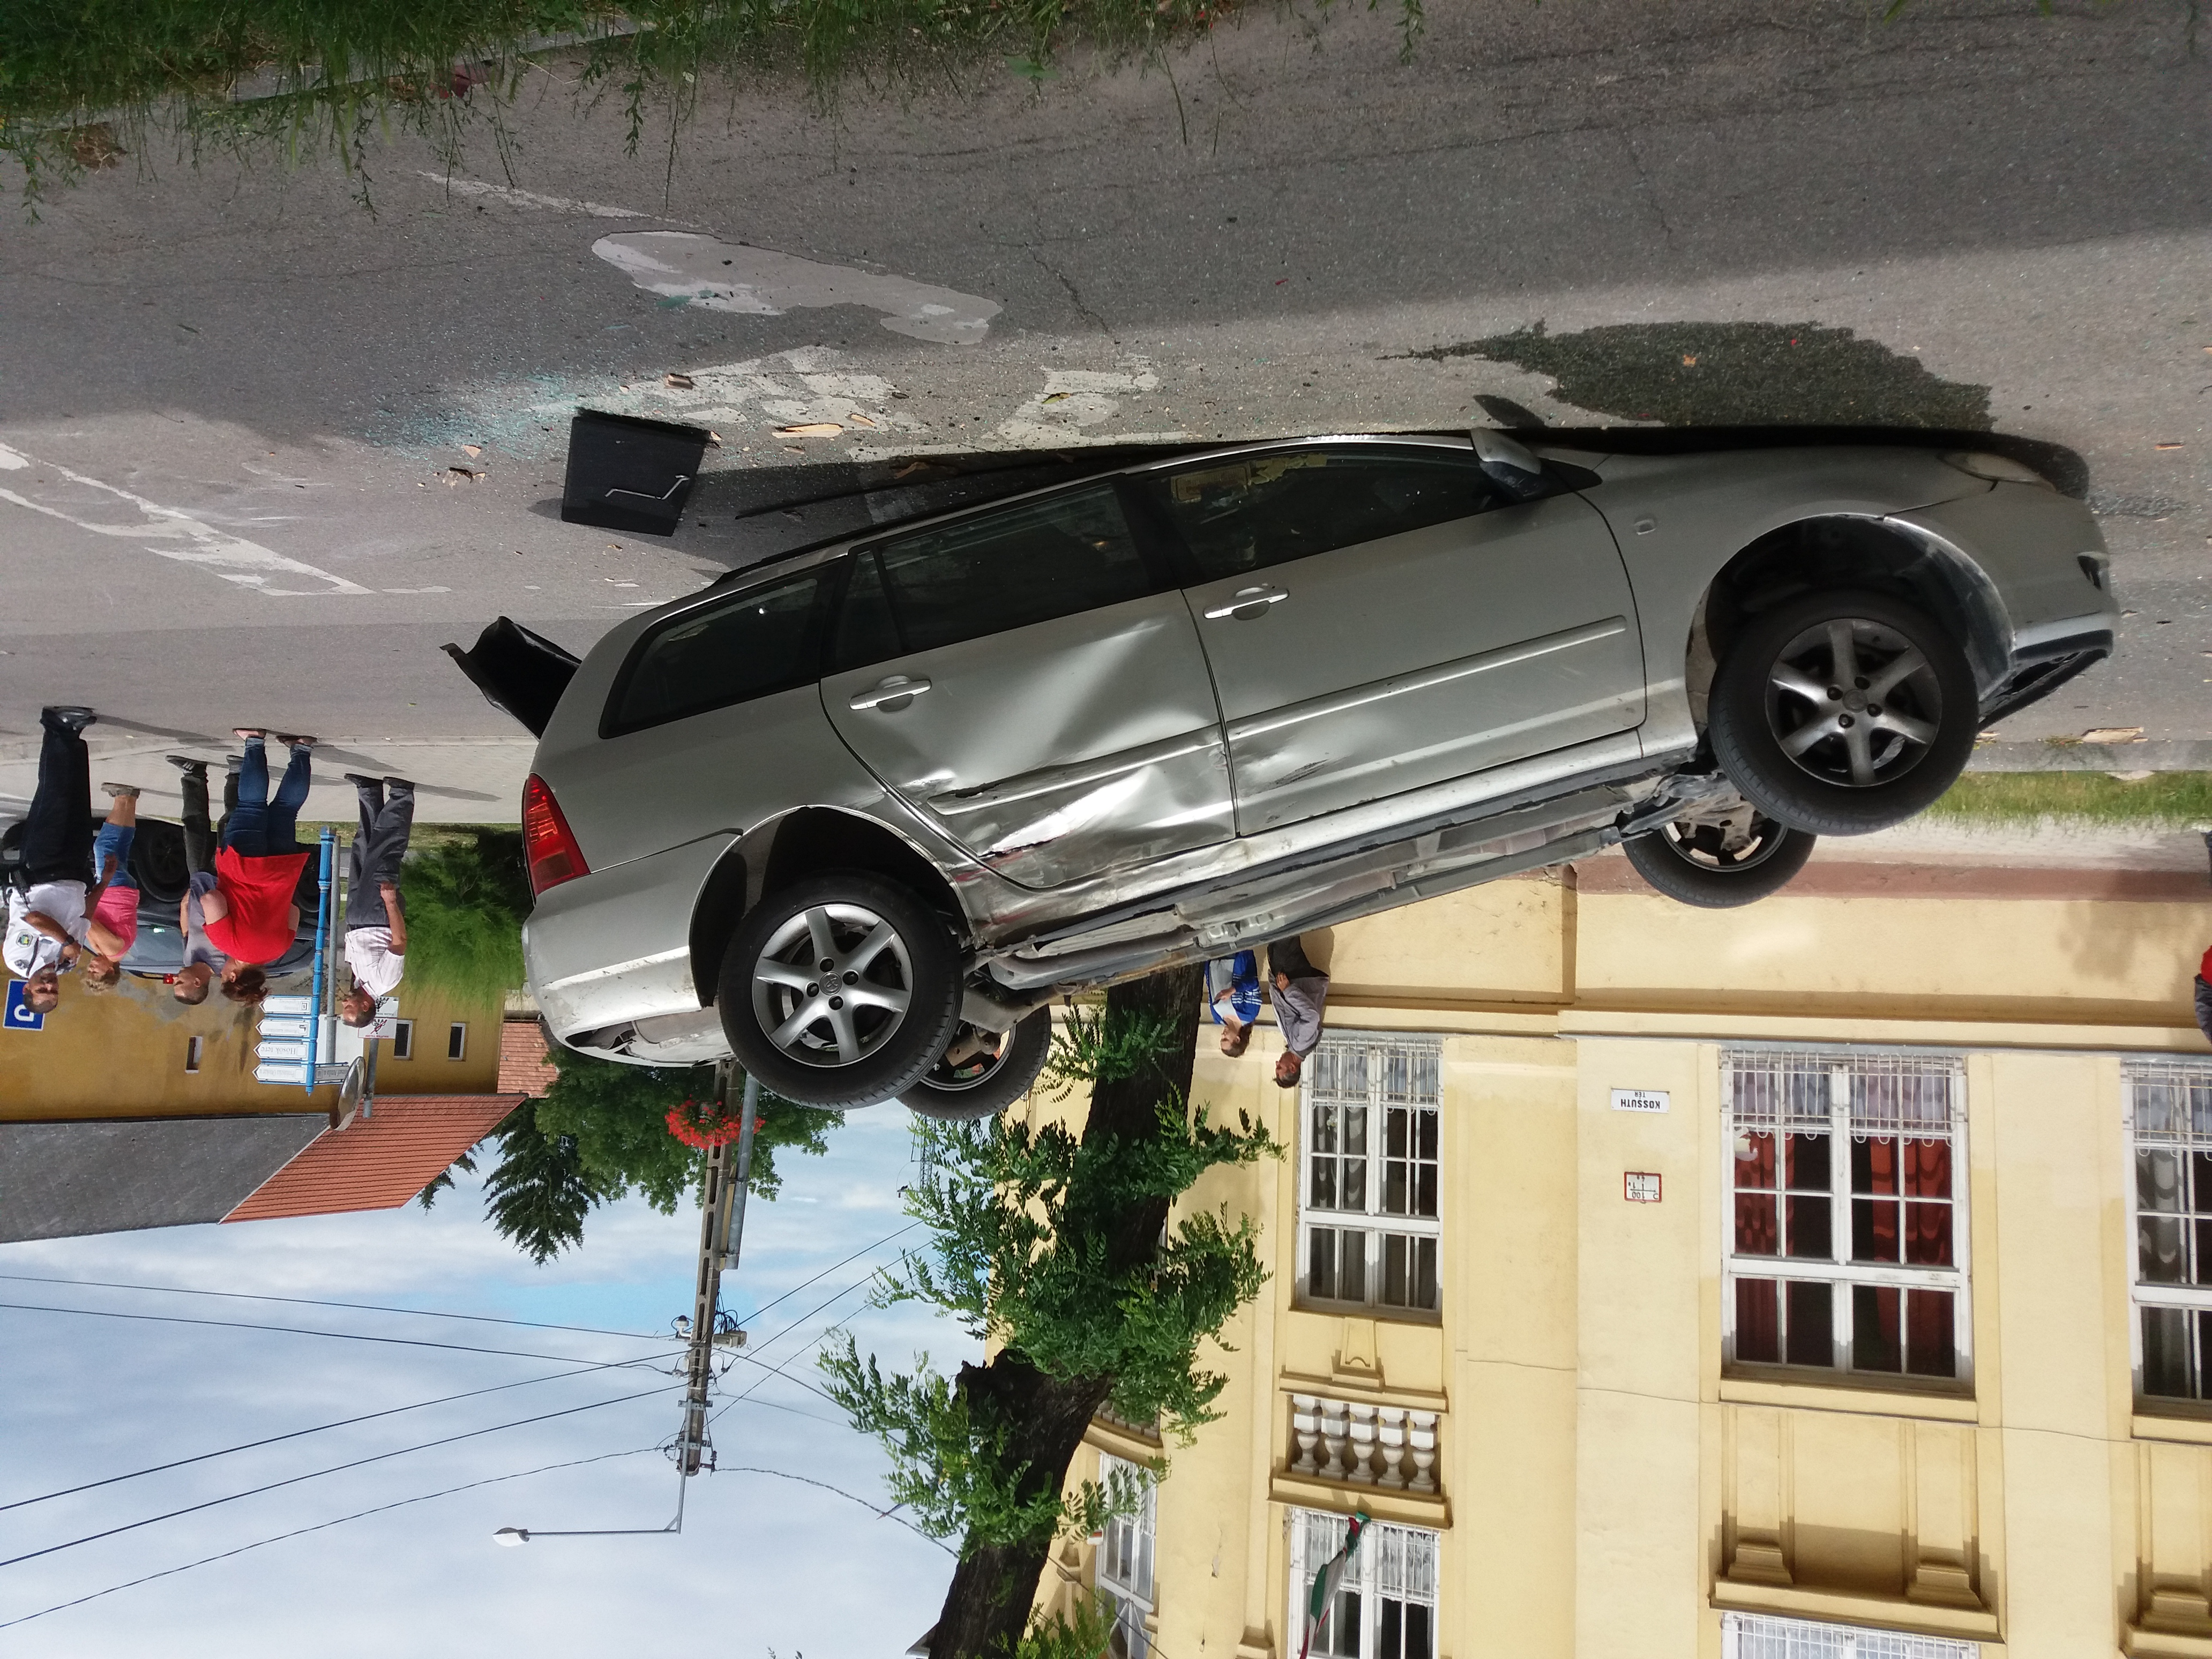 balesetovioldkocs.jpg